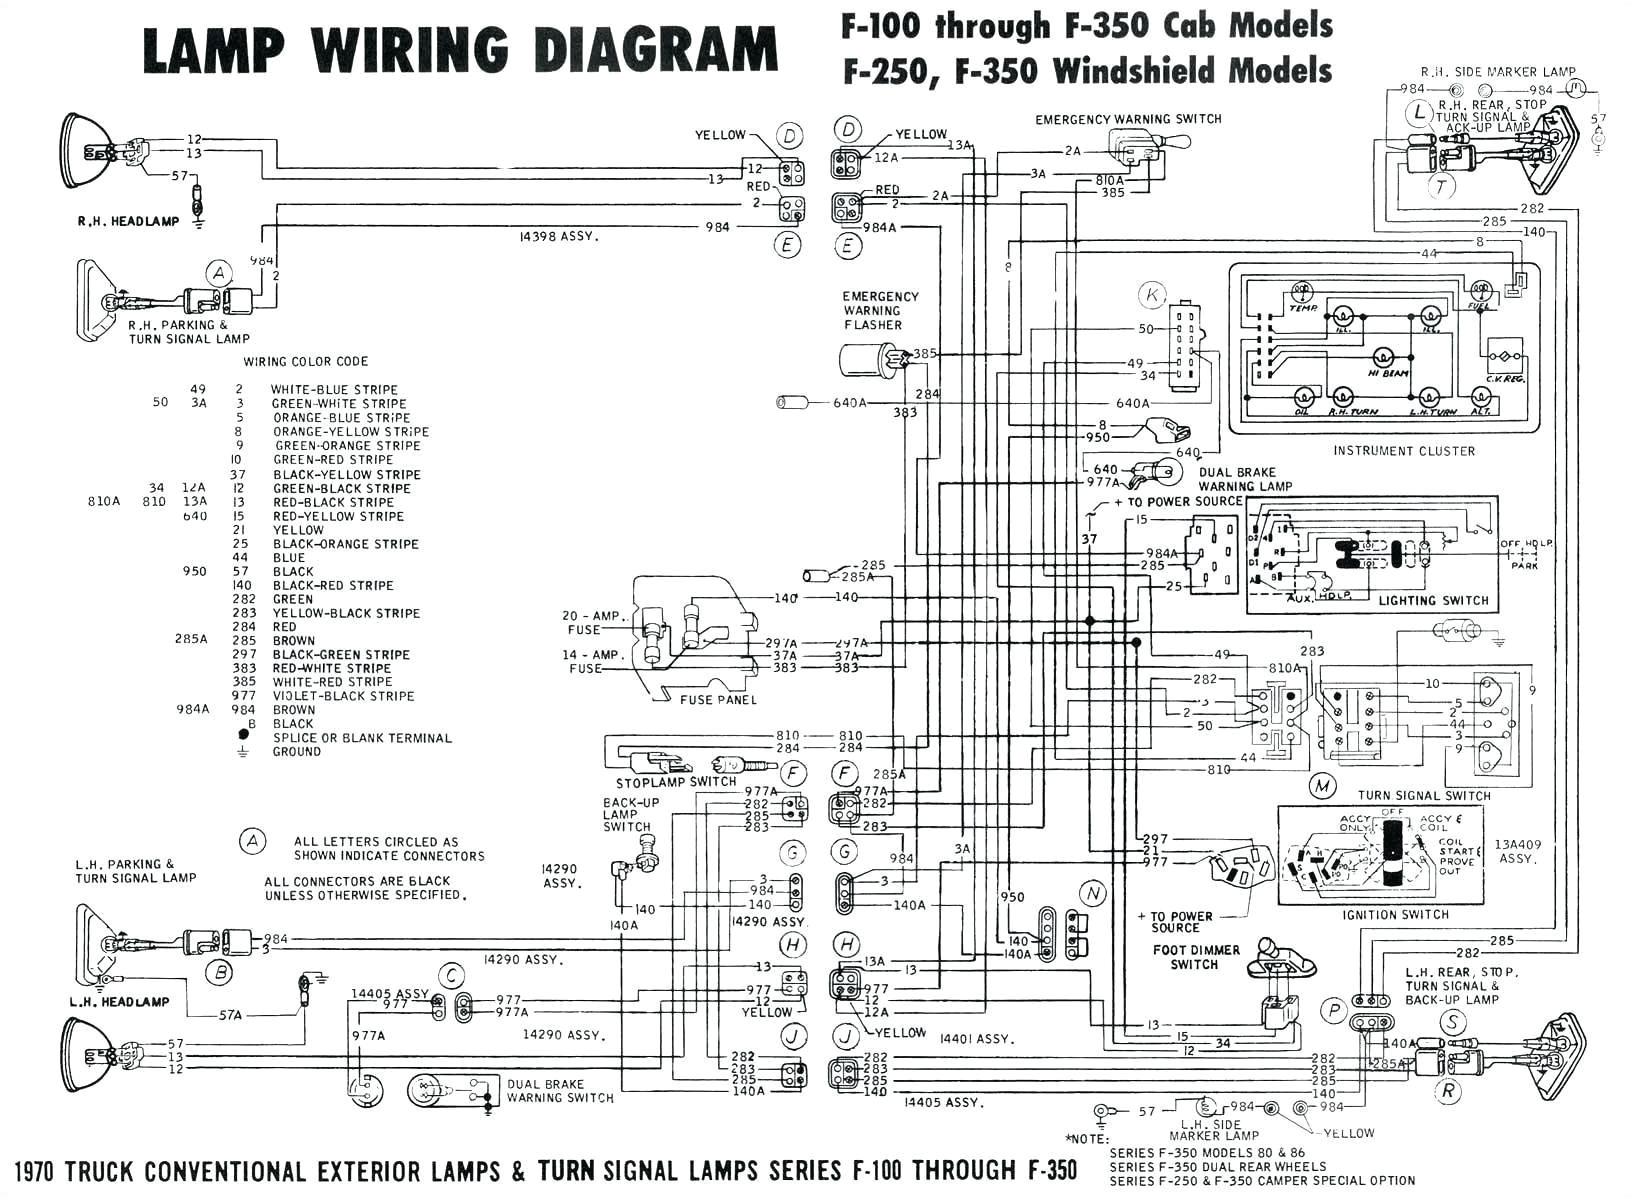 Noma thermostat Wiring Diagram Wiring Schematic for thermostat Wiring Diagram Database